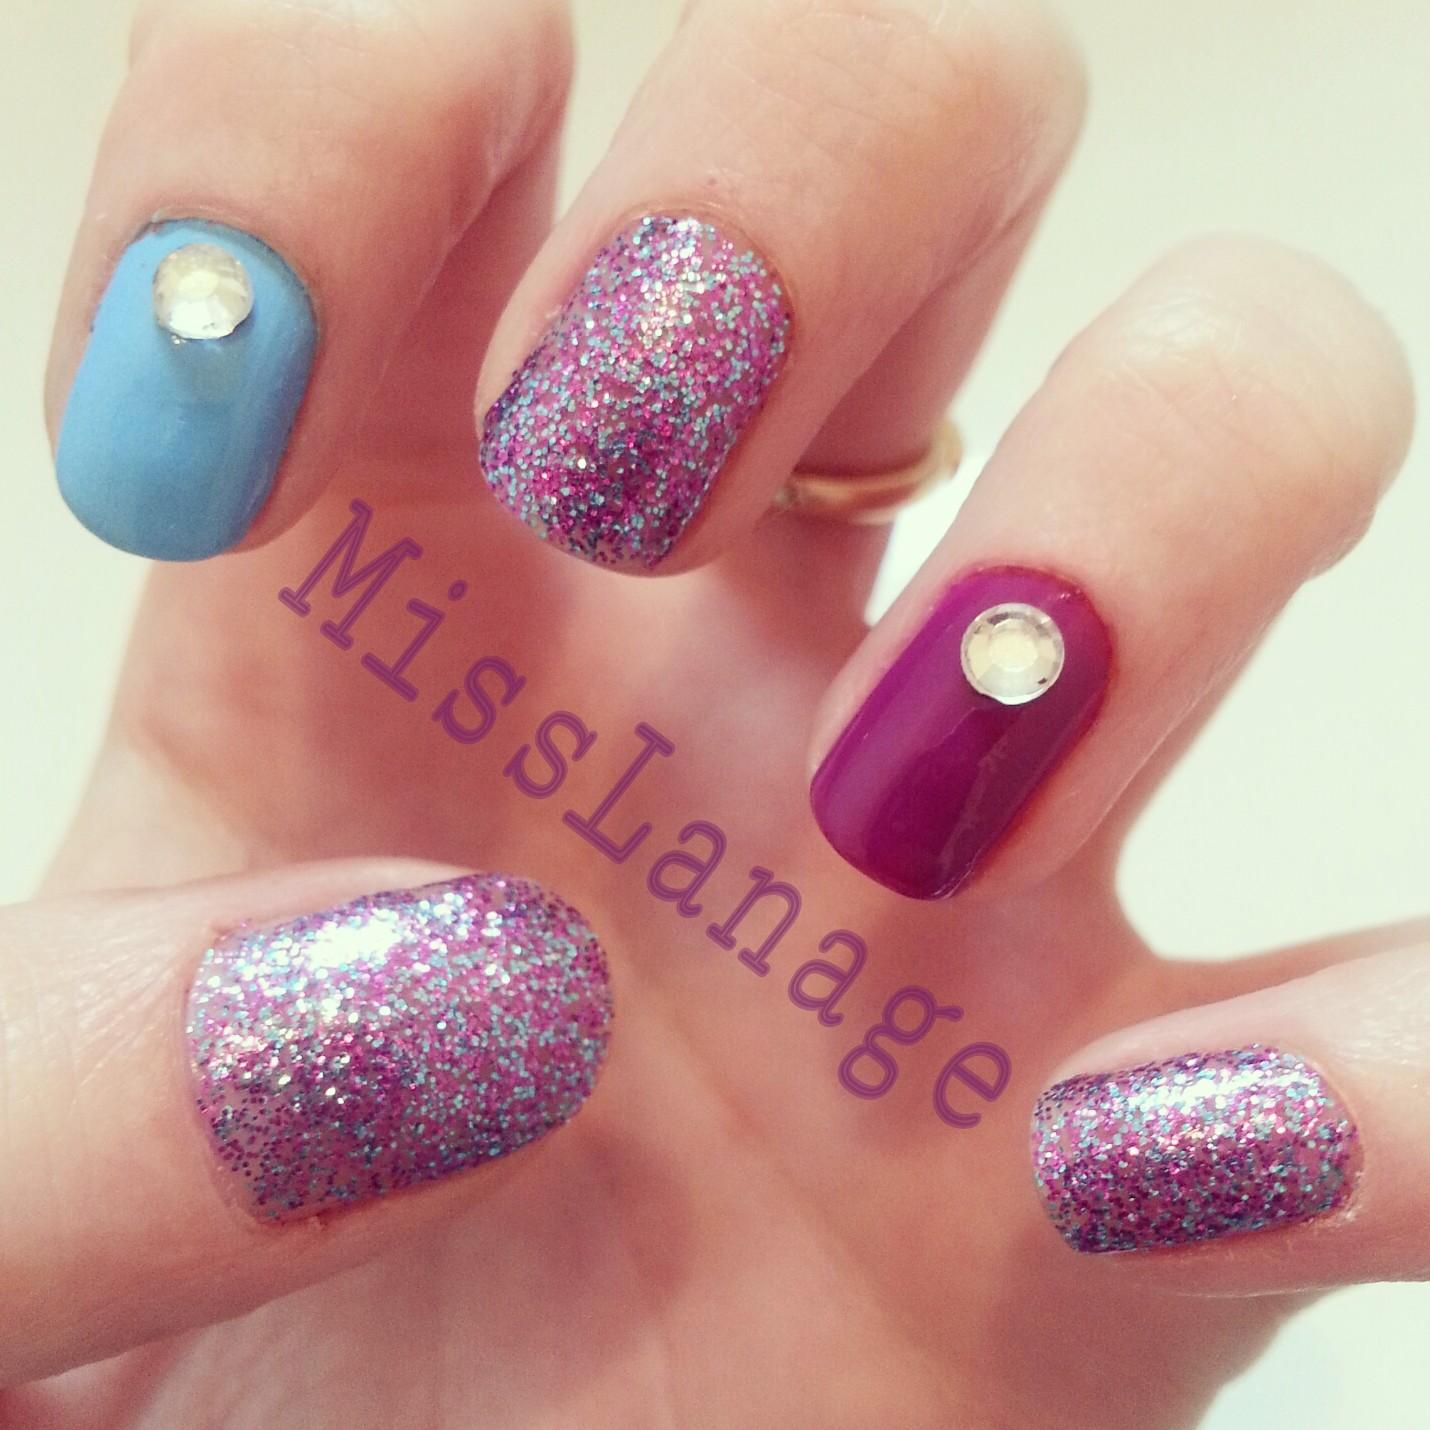 Nail Designs With Rhinestones - Pccala